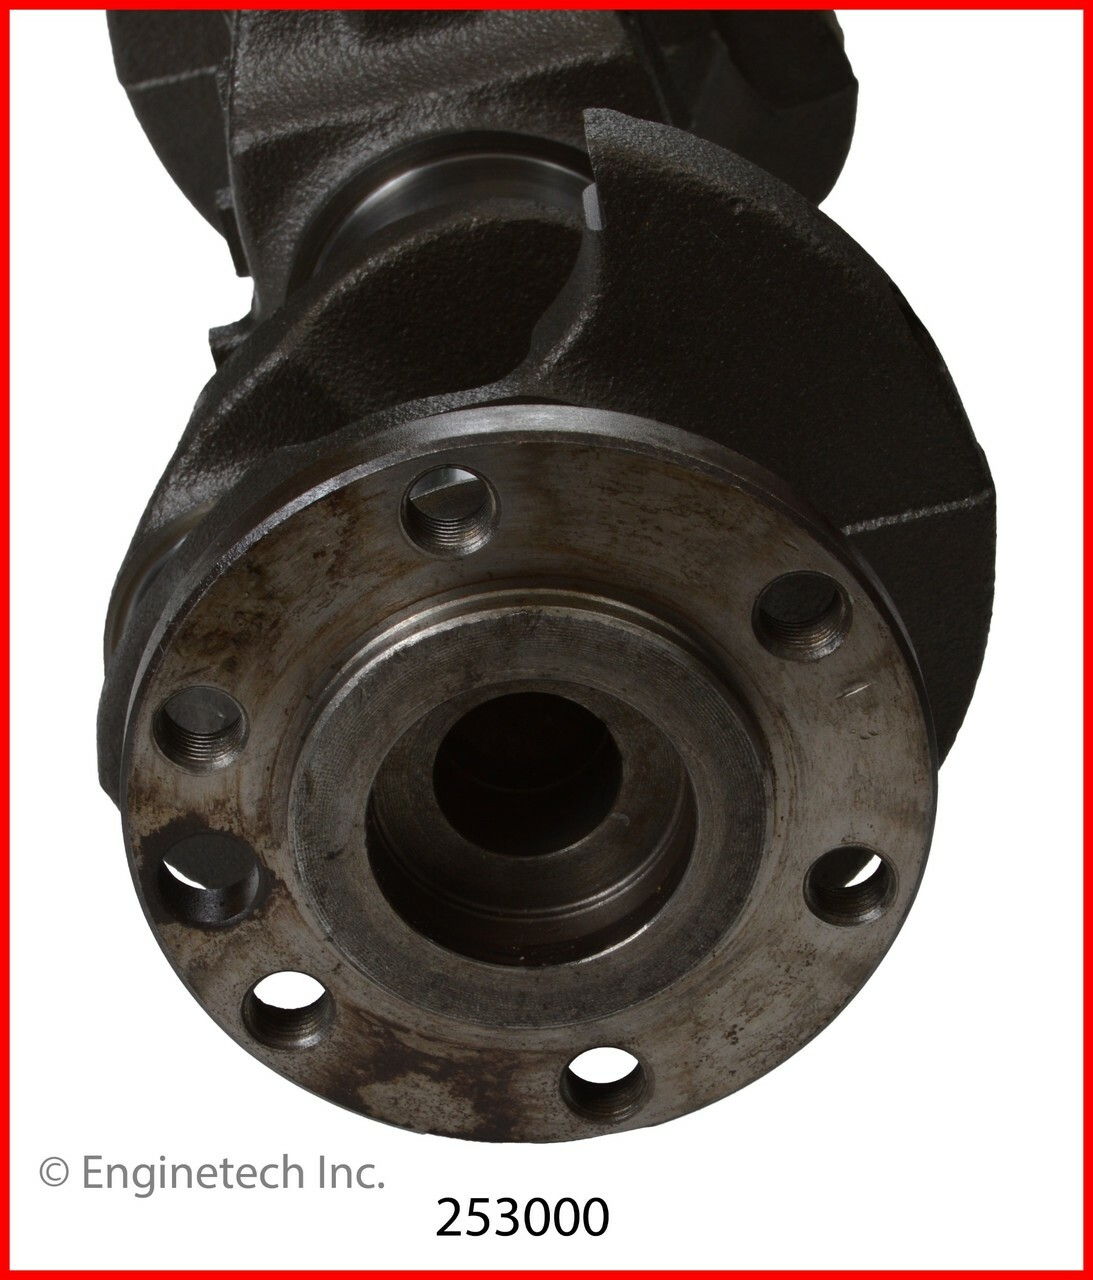 1988 American Motors Eagle 4.2L Engine Crankshaft Kit 253000.P4